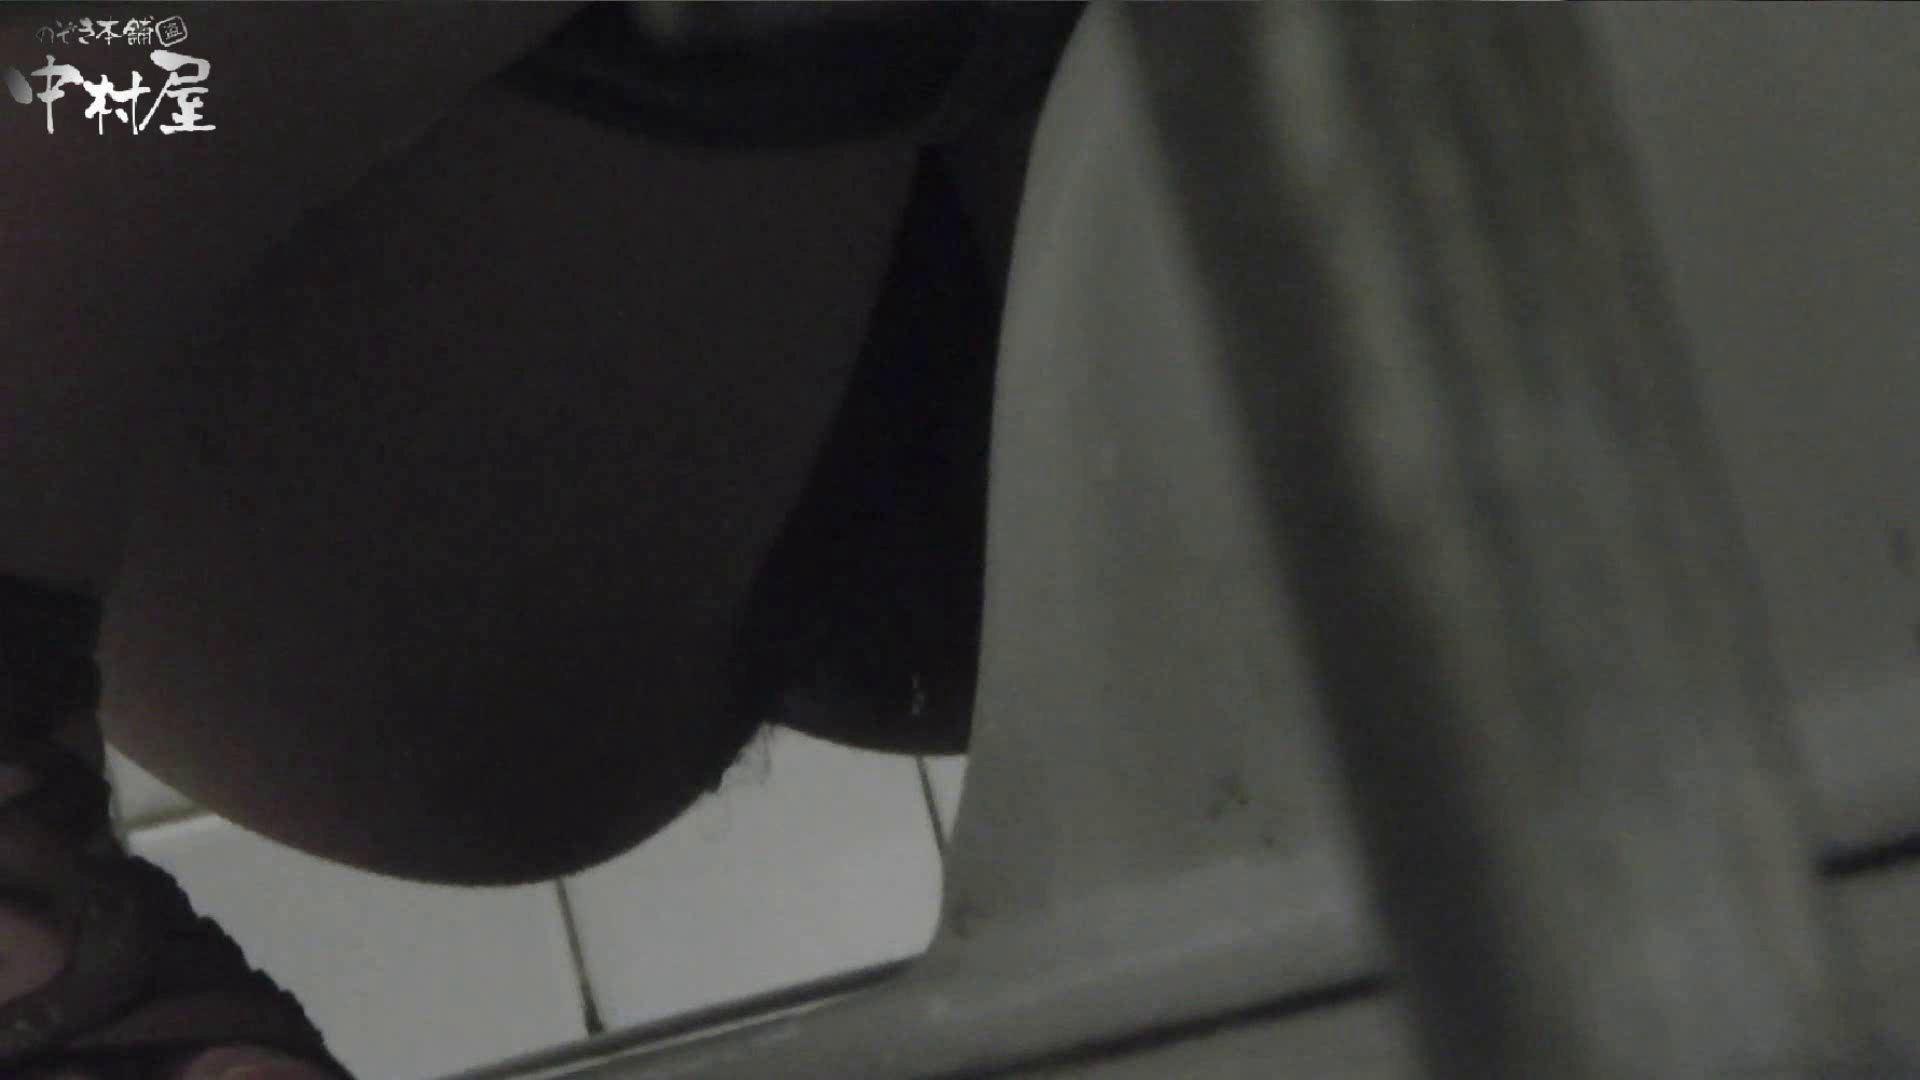 vol.42 命がけ潜伏洗面所! カカト上げながら・硬度強(太)・180g 洗面所編 のぞき動画キャプチャ 101PIX 47